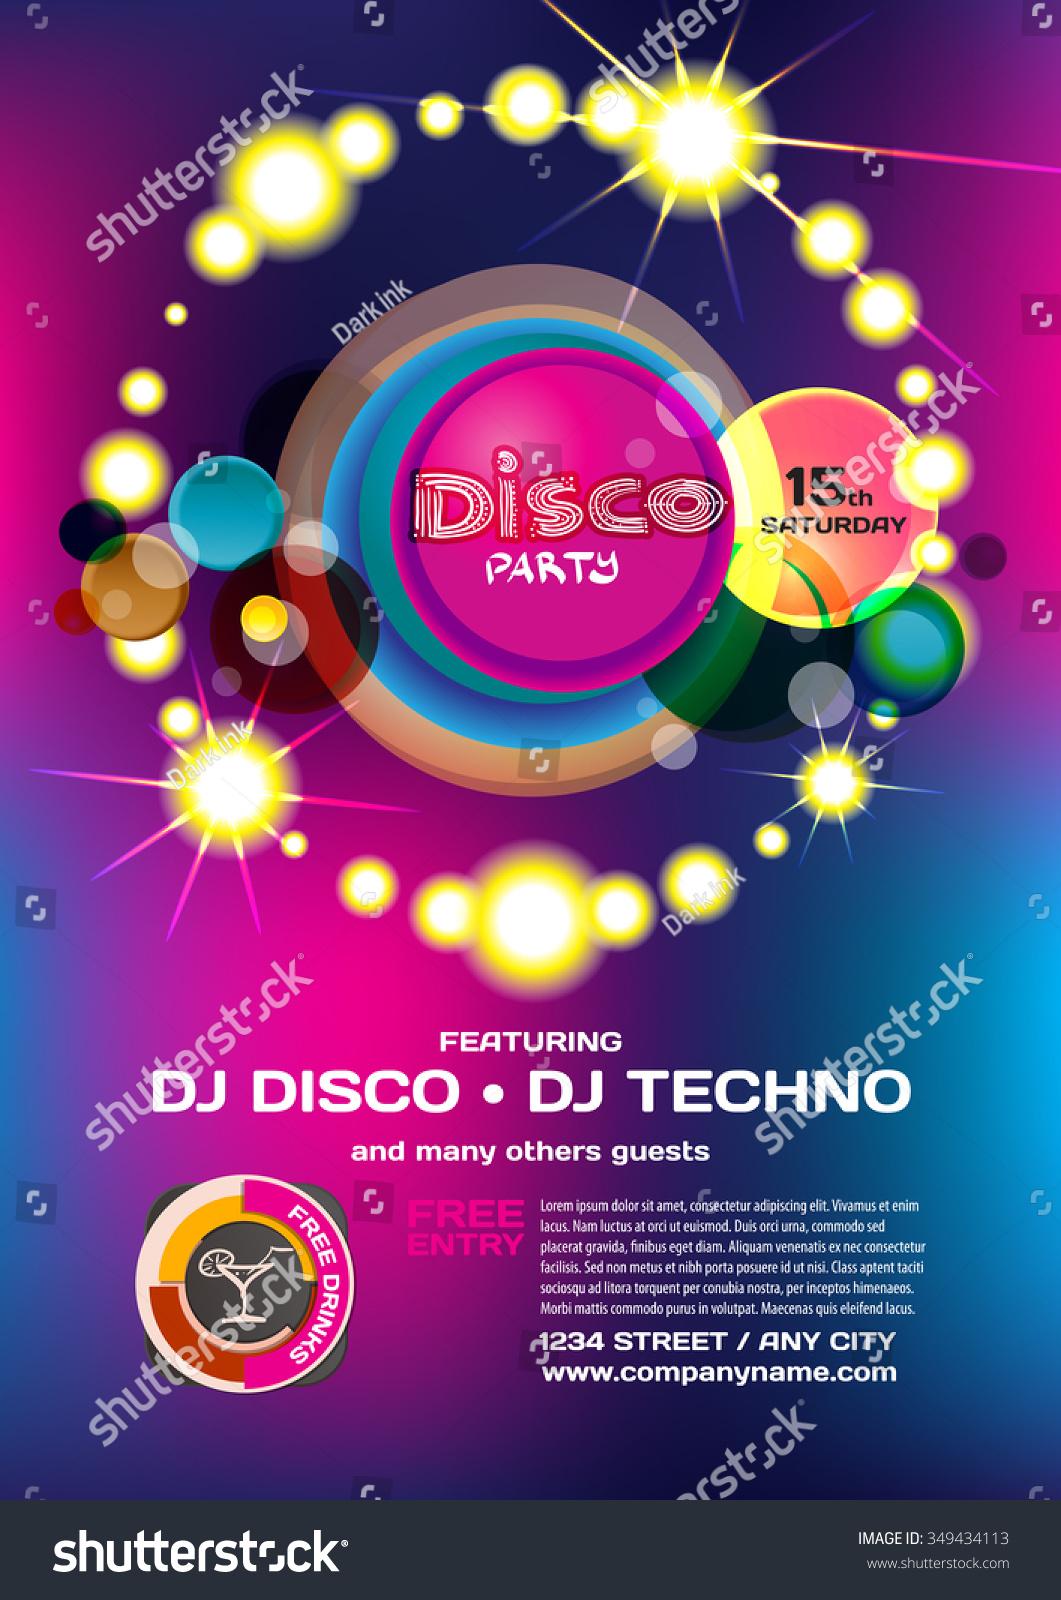 disco invitations free printable - Jcmanagement.co